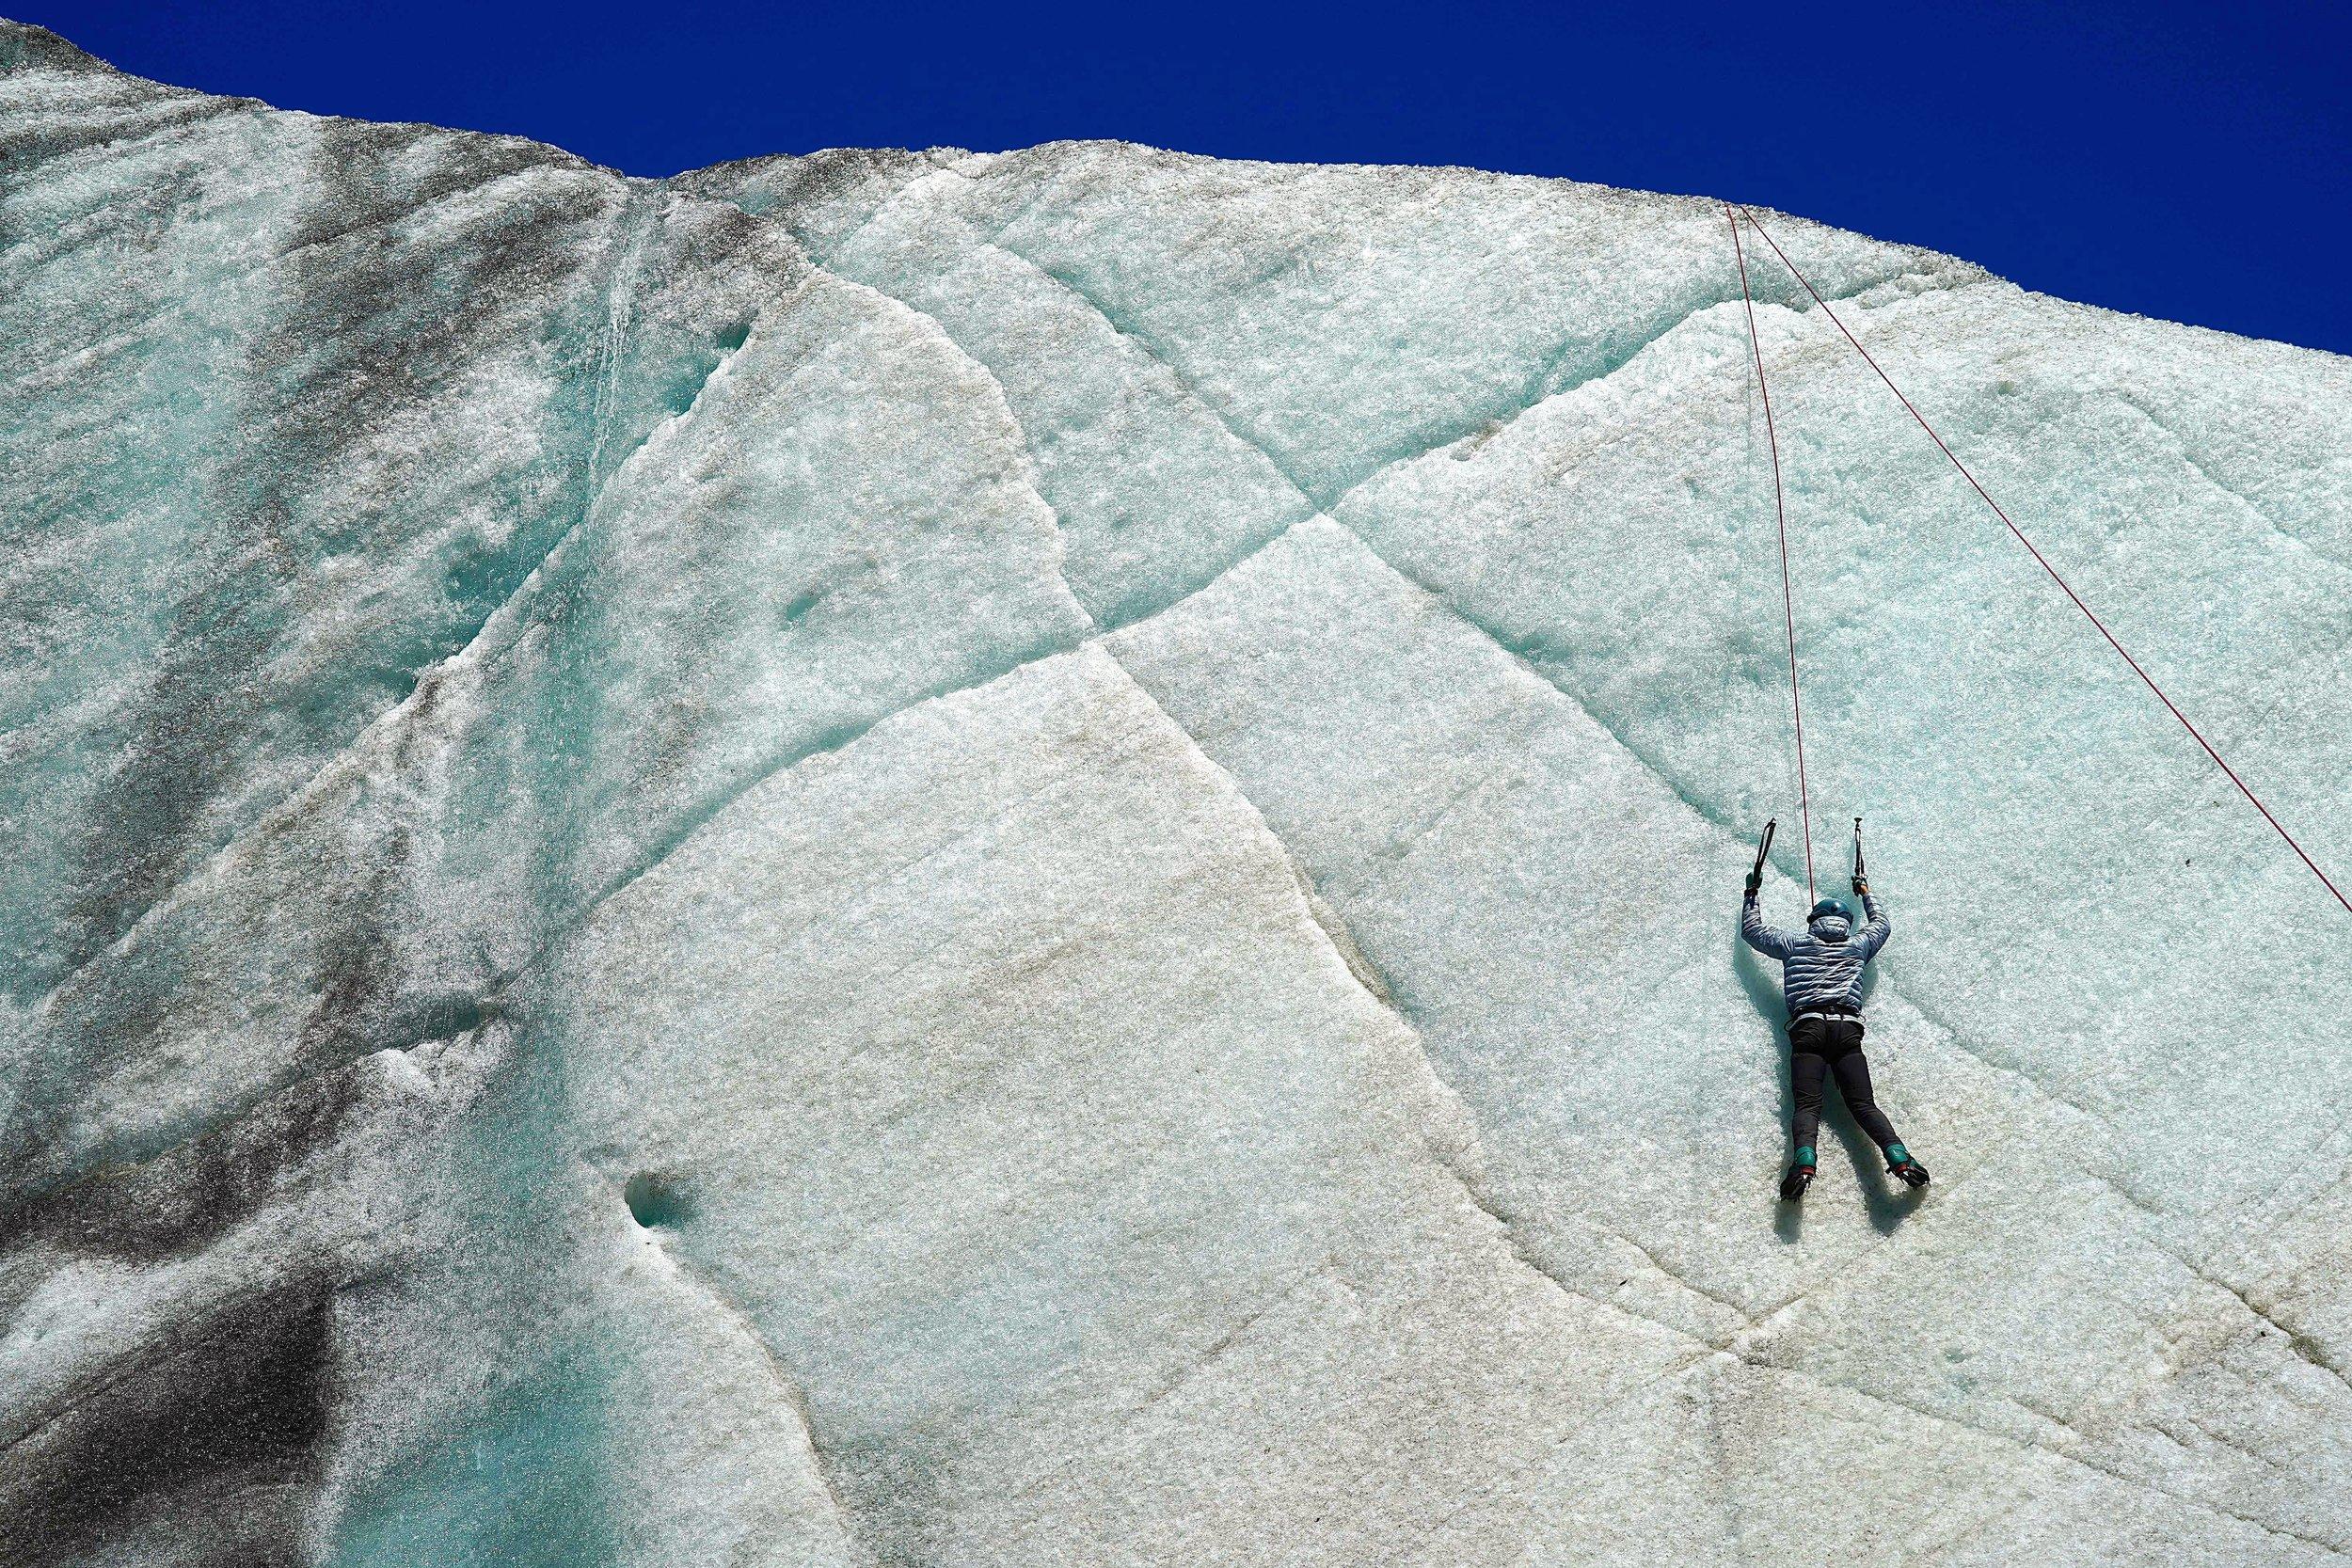 2/Climb an ice wall